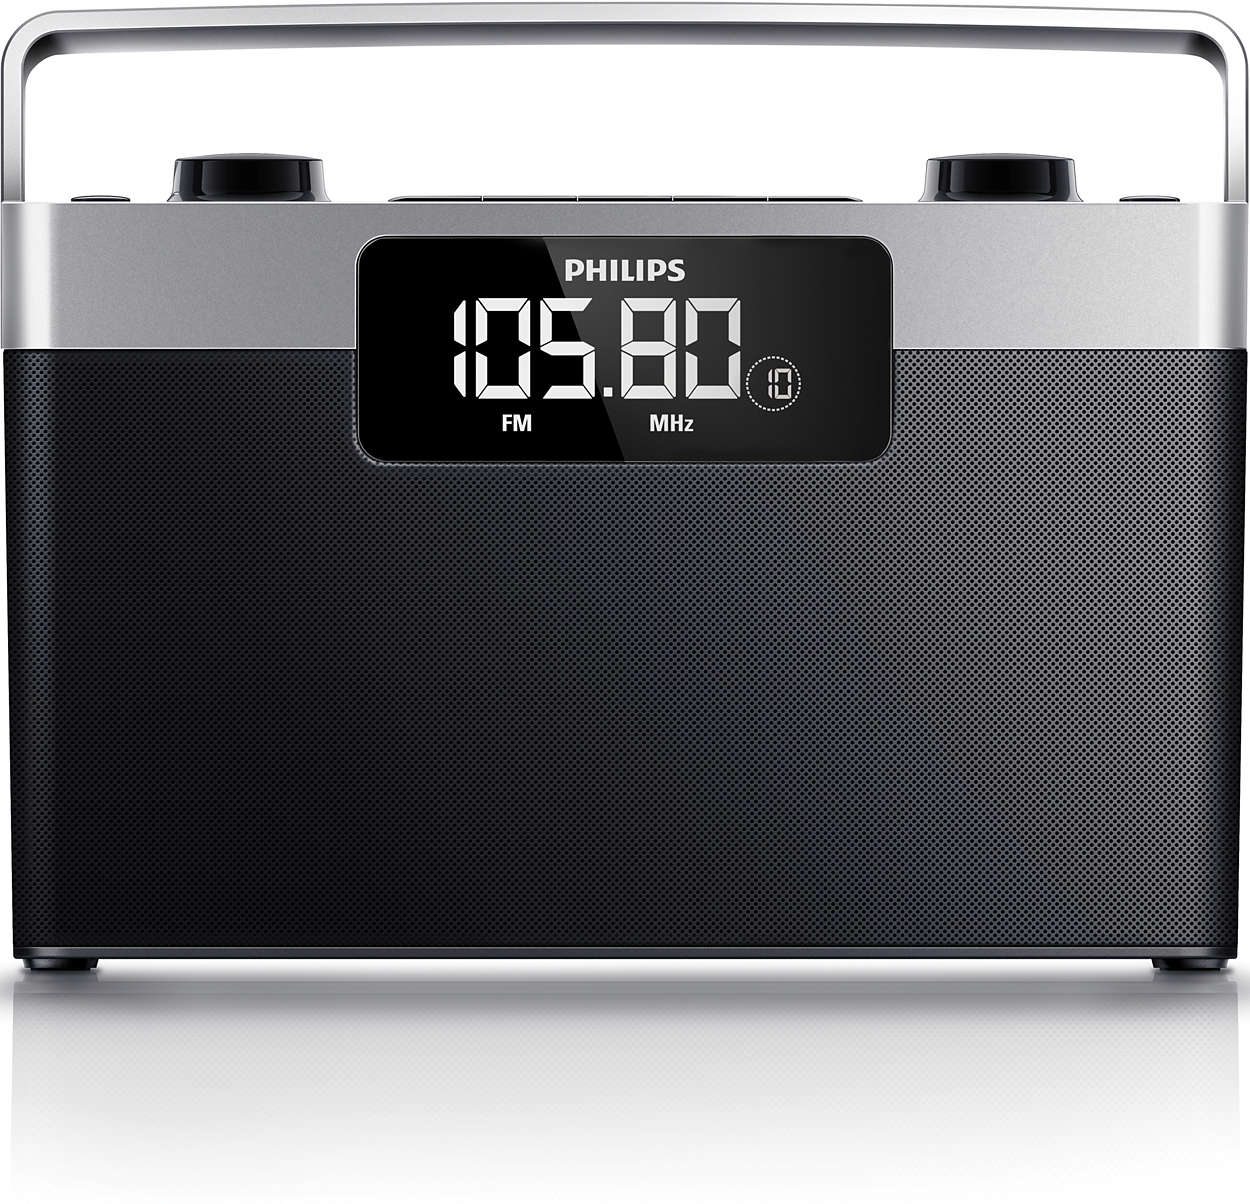 Radio portable ae2430 12 philips for Radio numerique portable